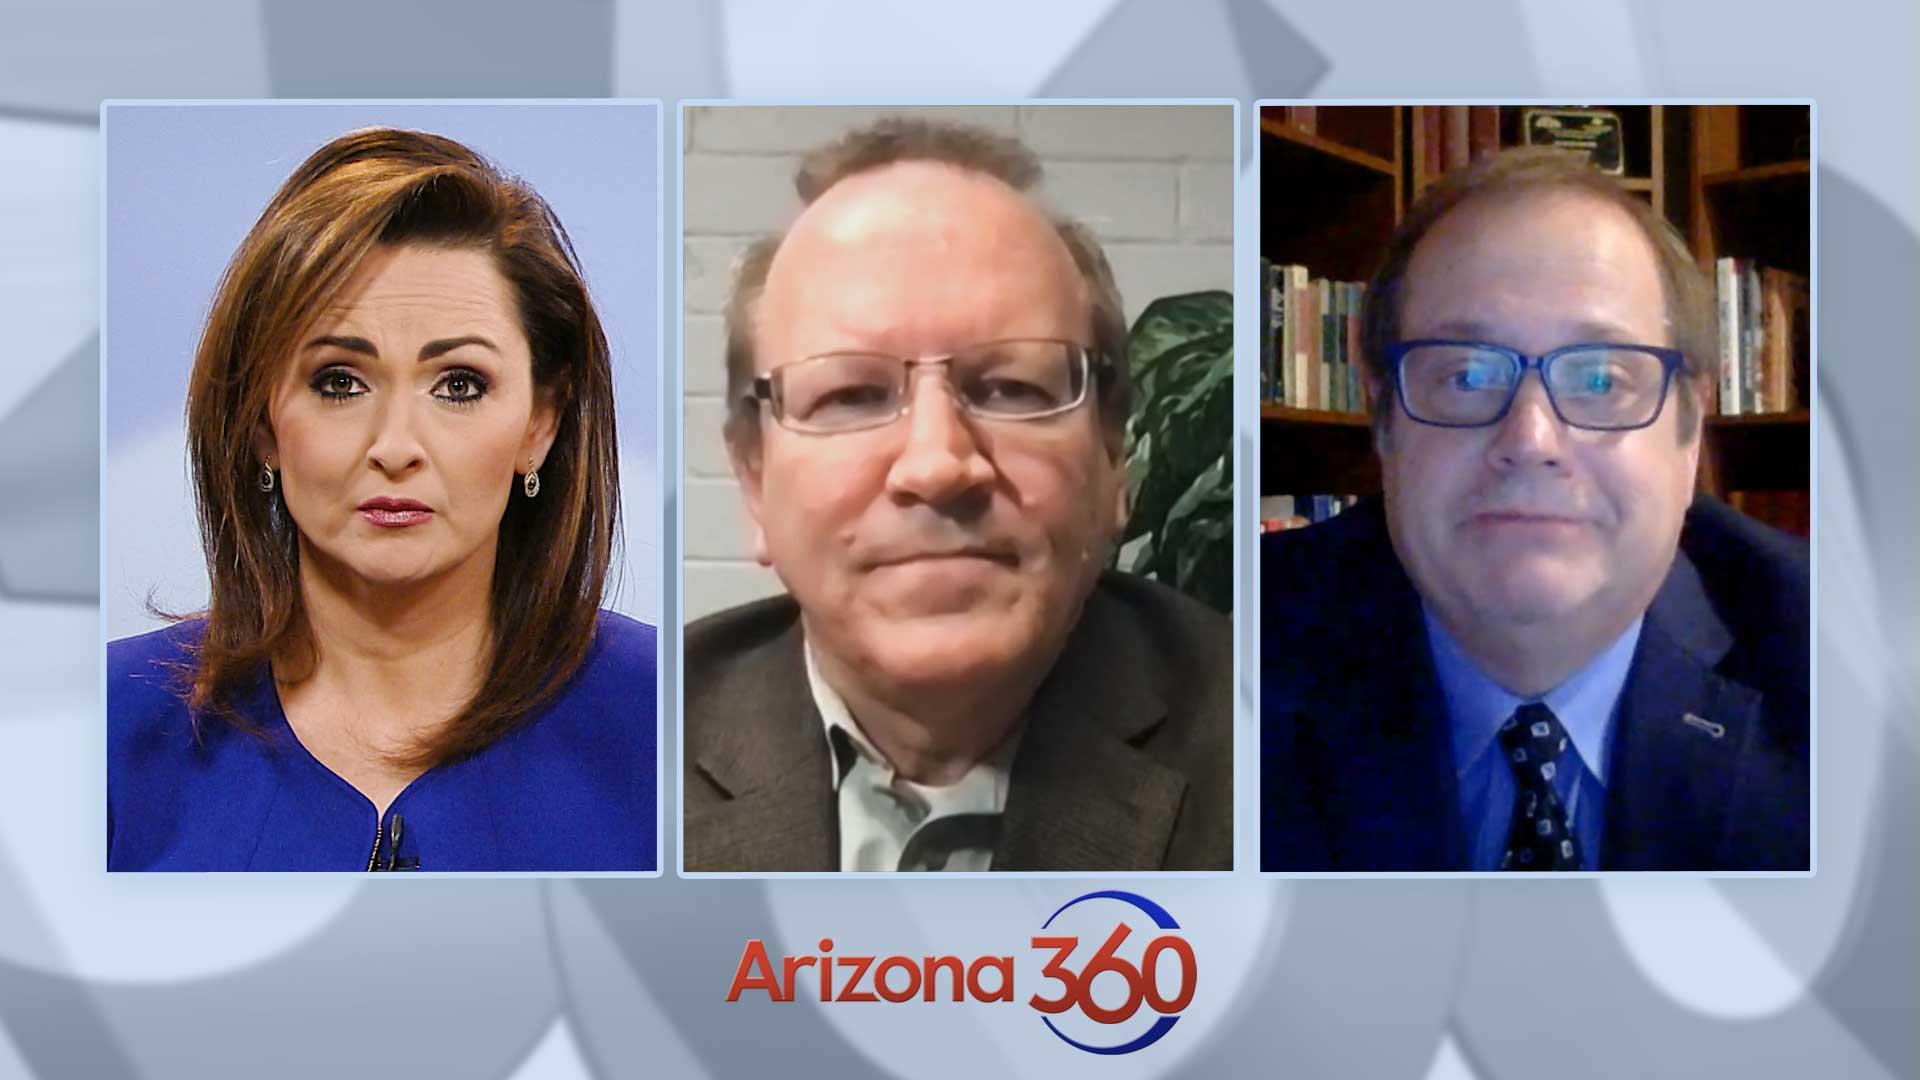 From left to right: Arizona 360 host Lorraine Rivera, Green Valley News/Sahuarita Sun editor Dan Shearer, Tucson Weekly/Tucson Local Media executive editor Jim Nintzel.